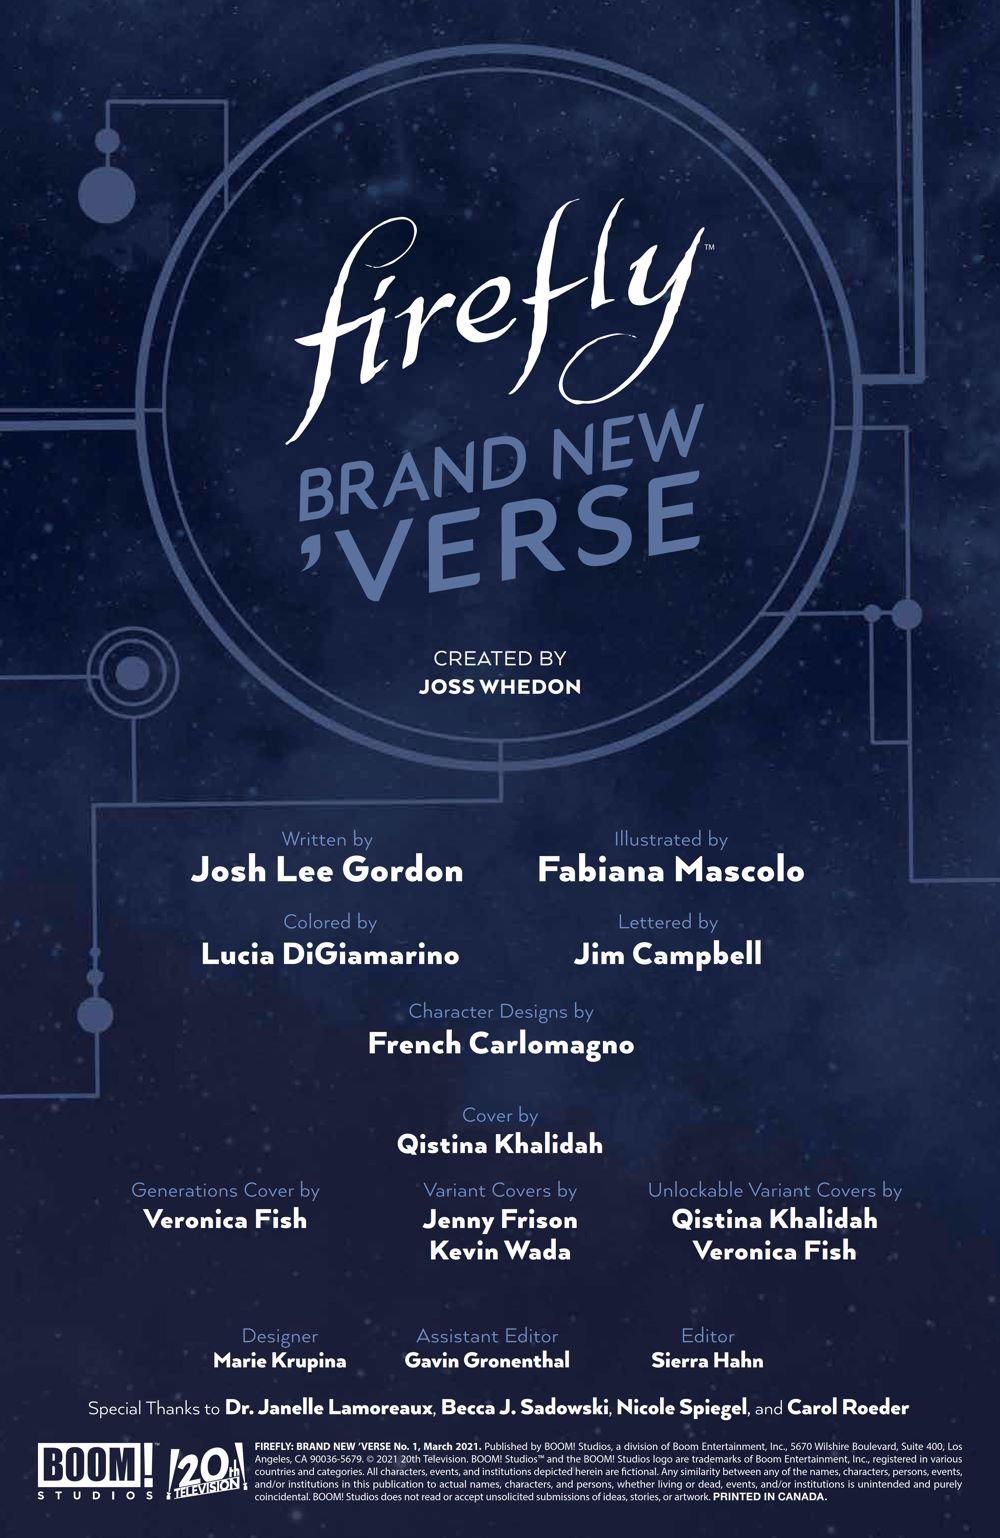 Firefly_BrandNewVerse_001_PRESS_2 ComicList Previews: FIREFLY BRAND NEW 'VERSE #1